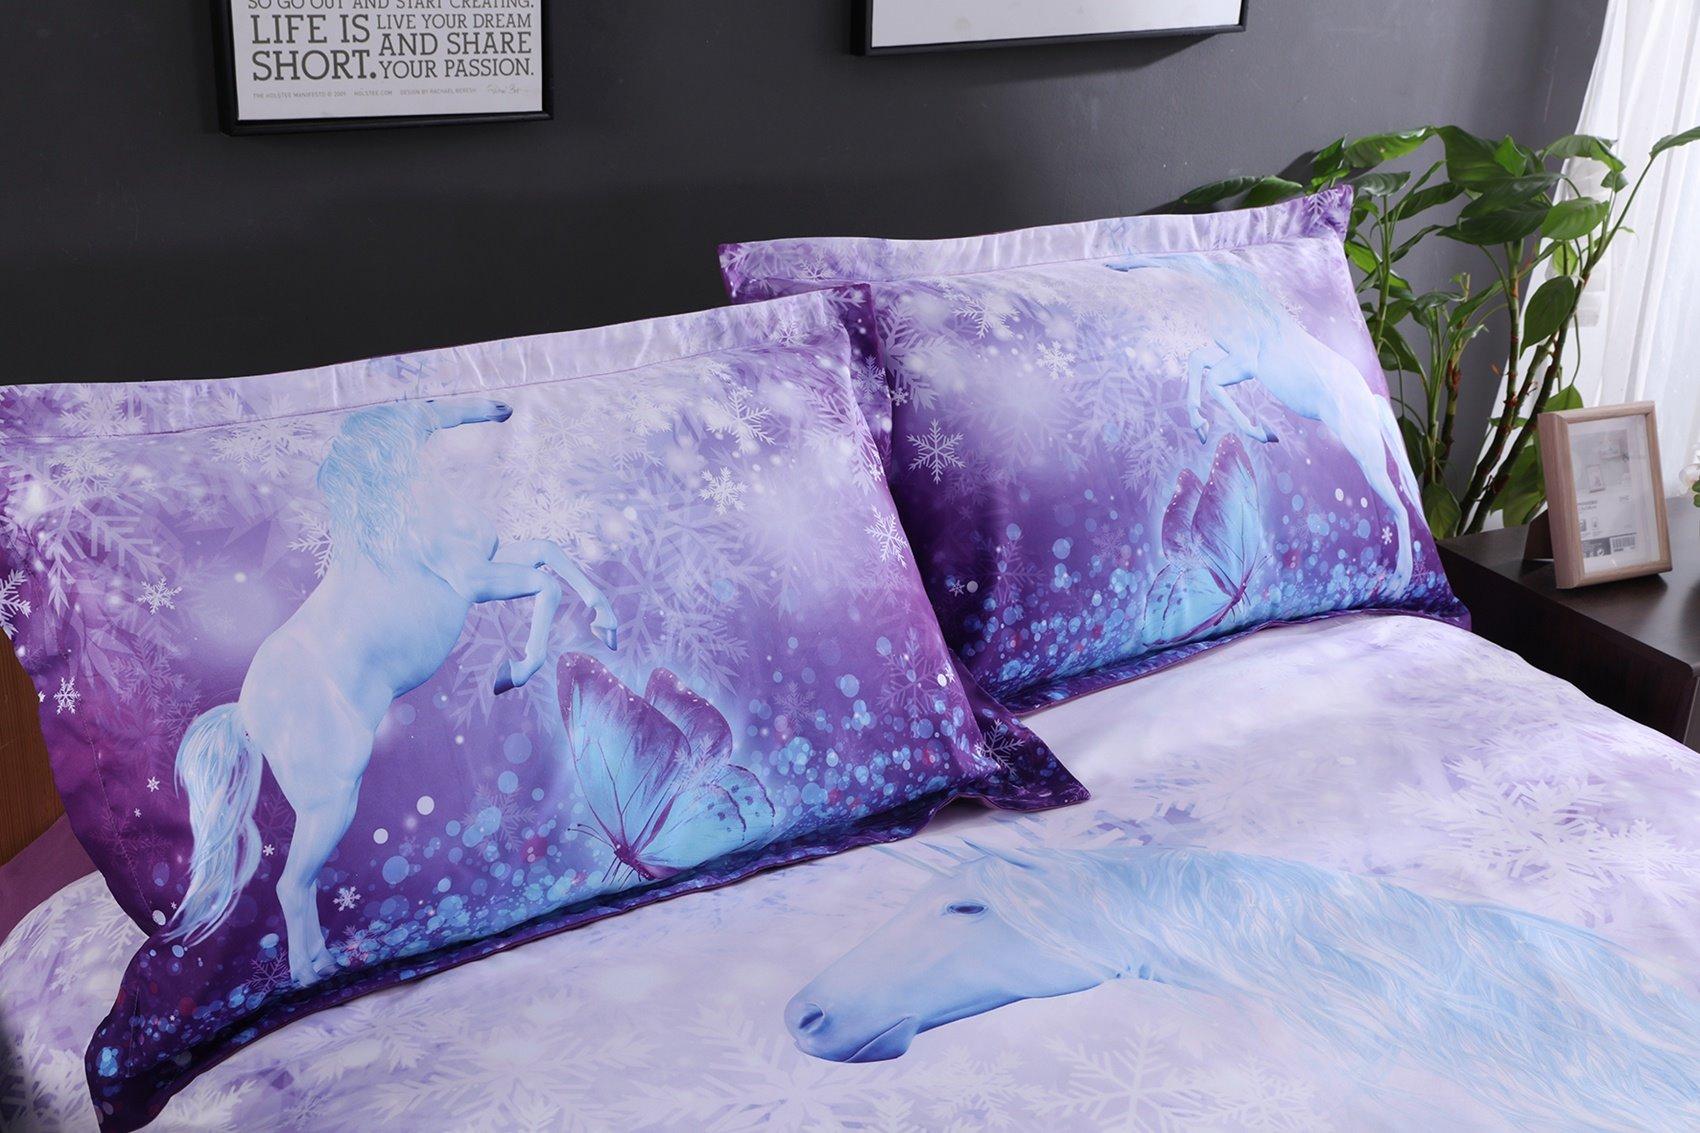 Find the Best Flash Sales Ads for Upcoming Bedding Beddinginncom